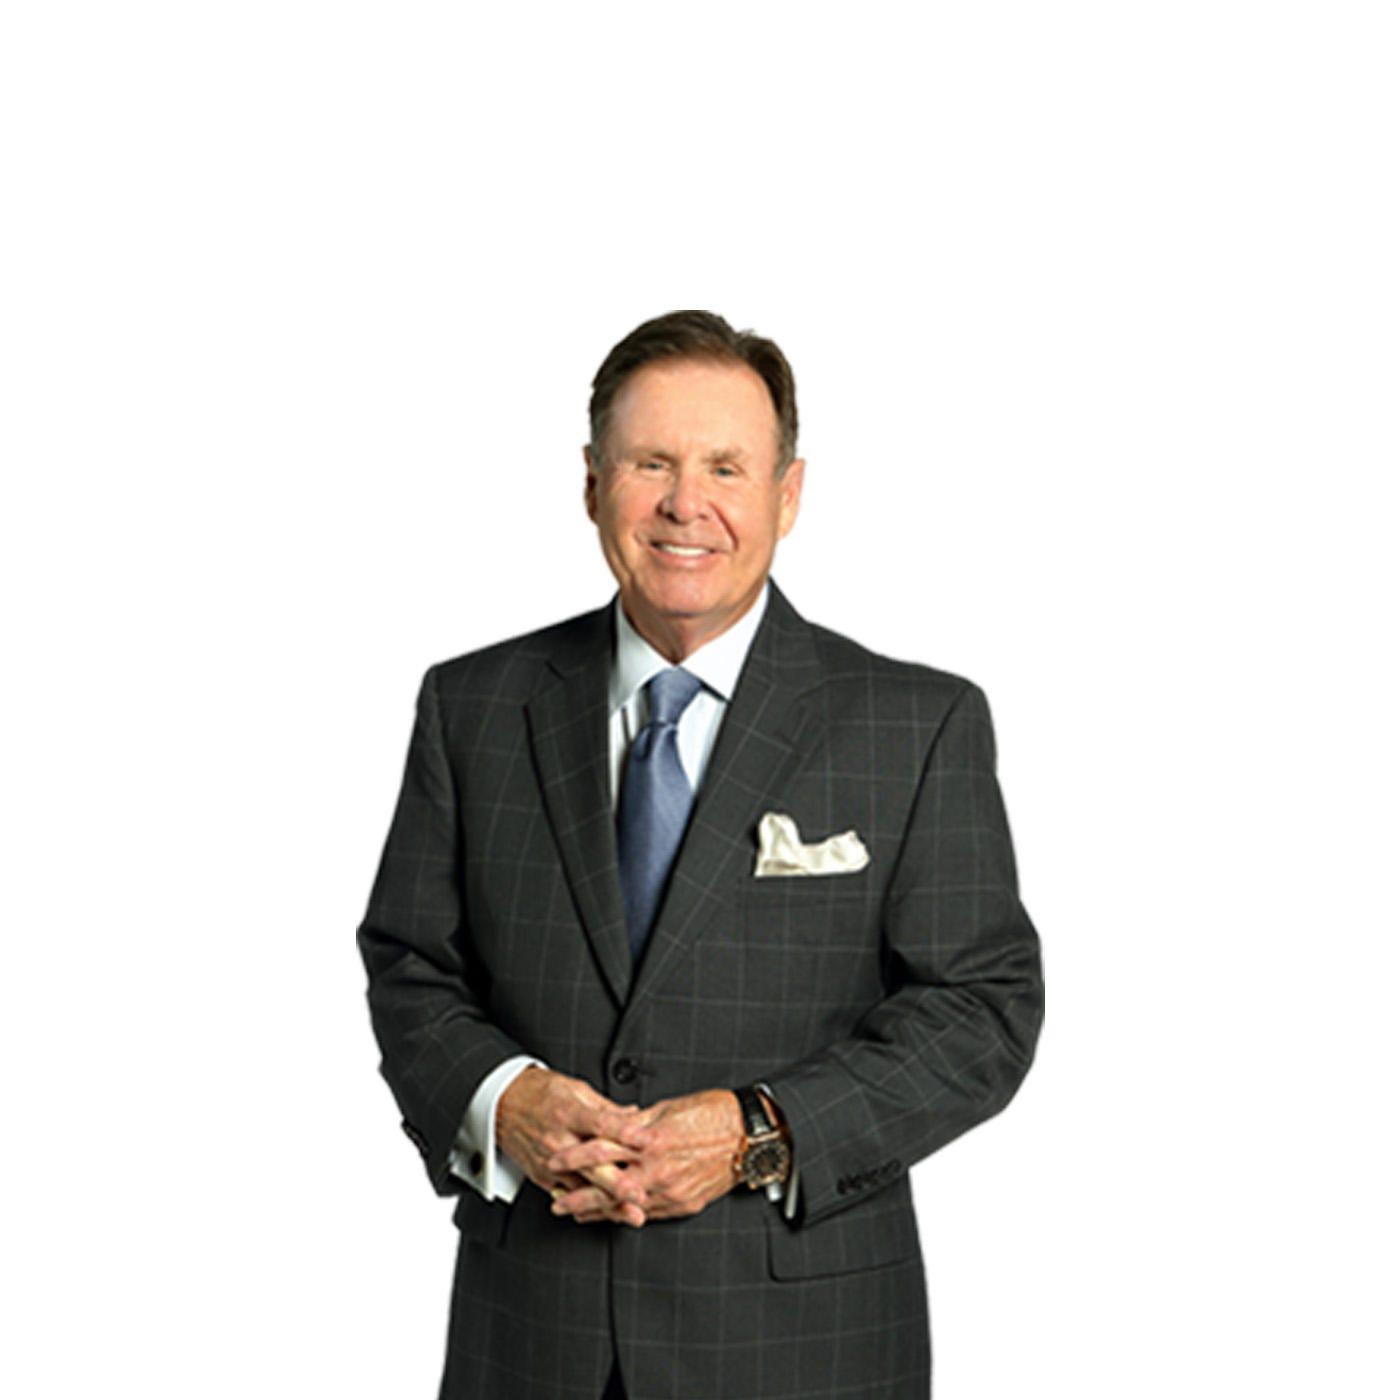 Bob McLain